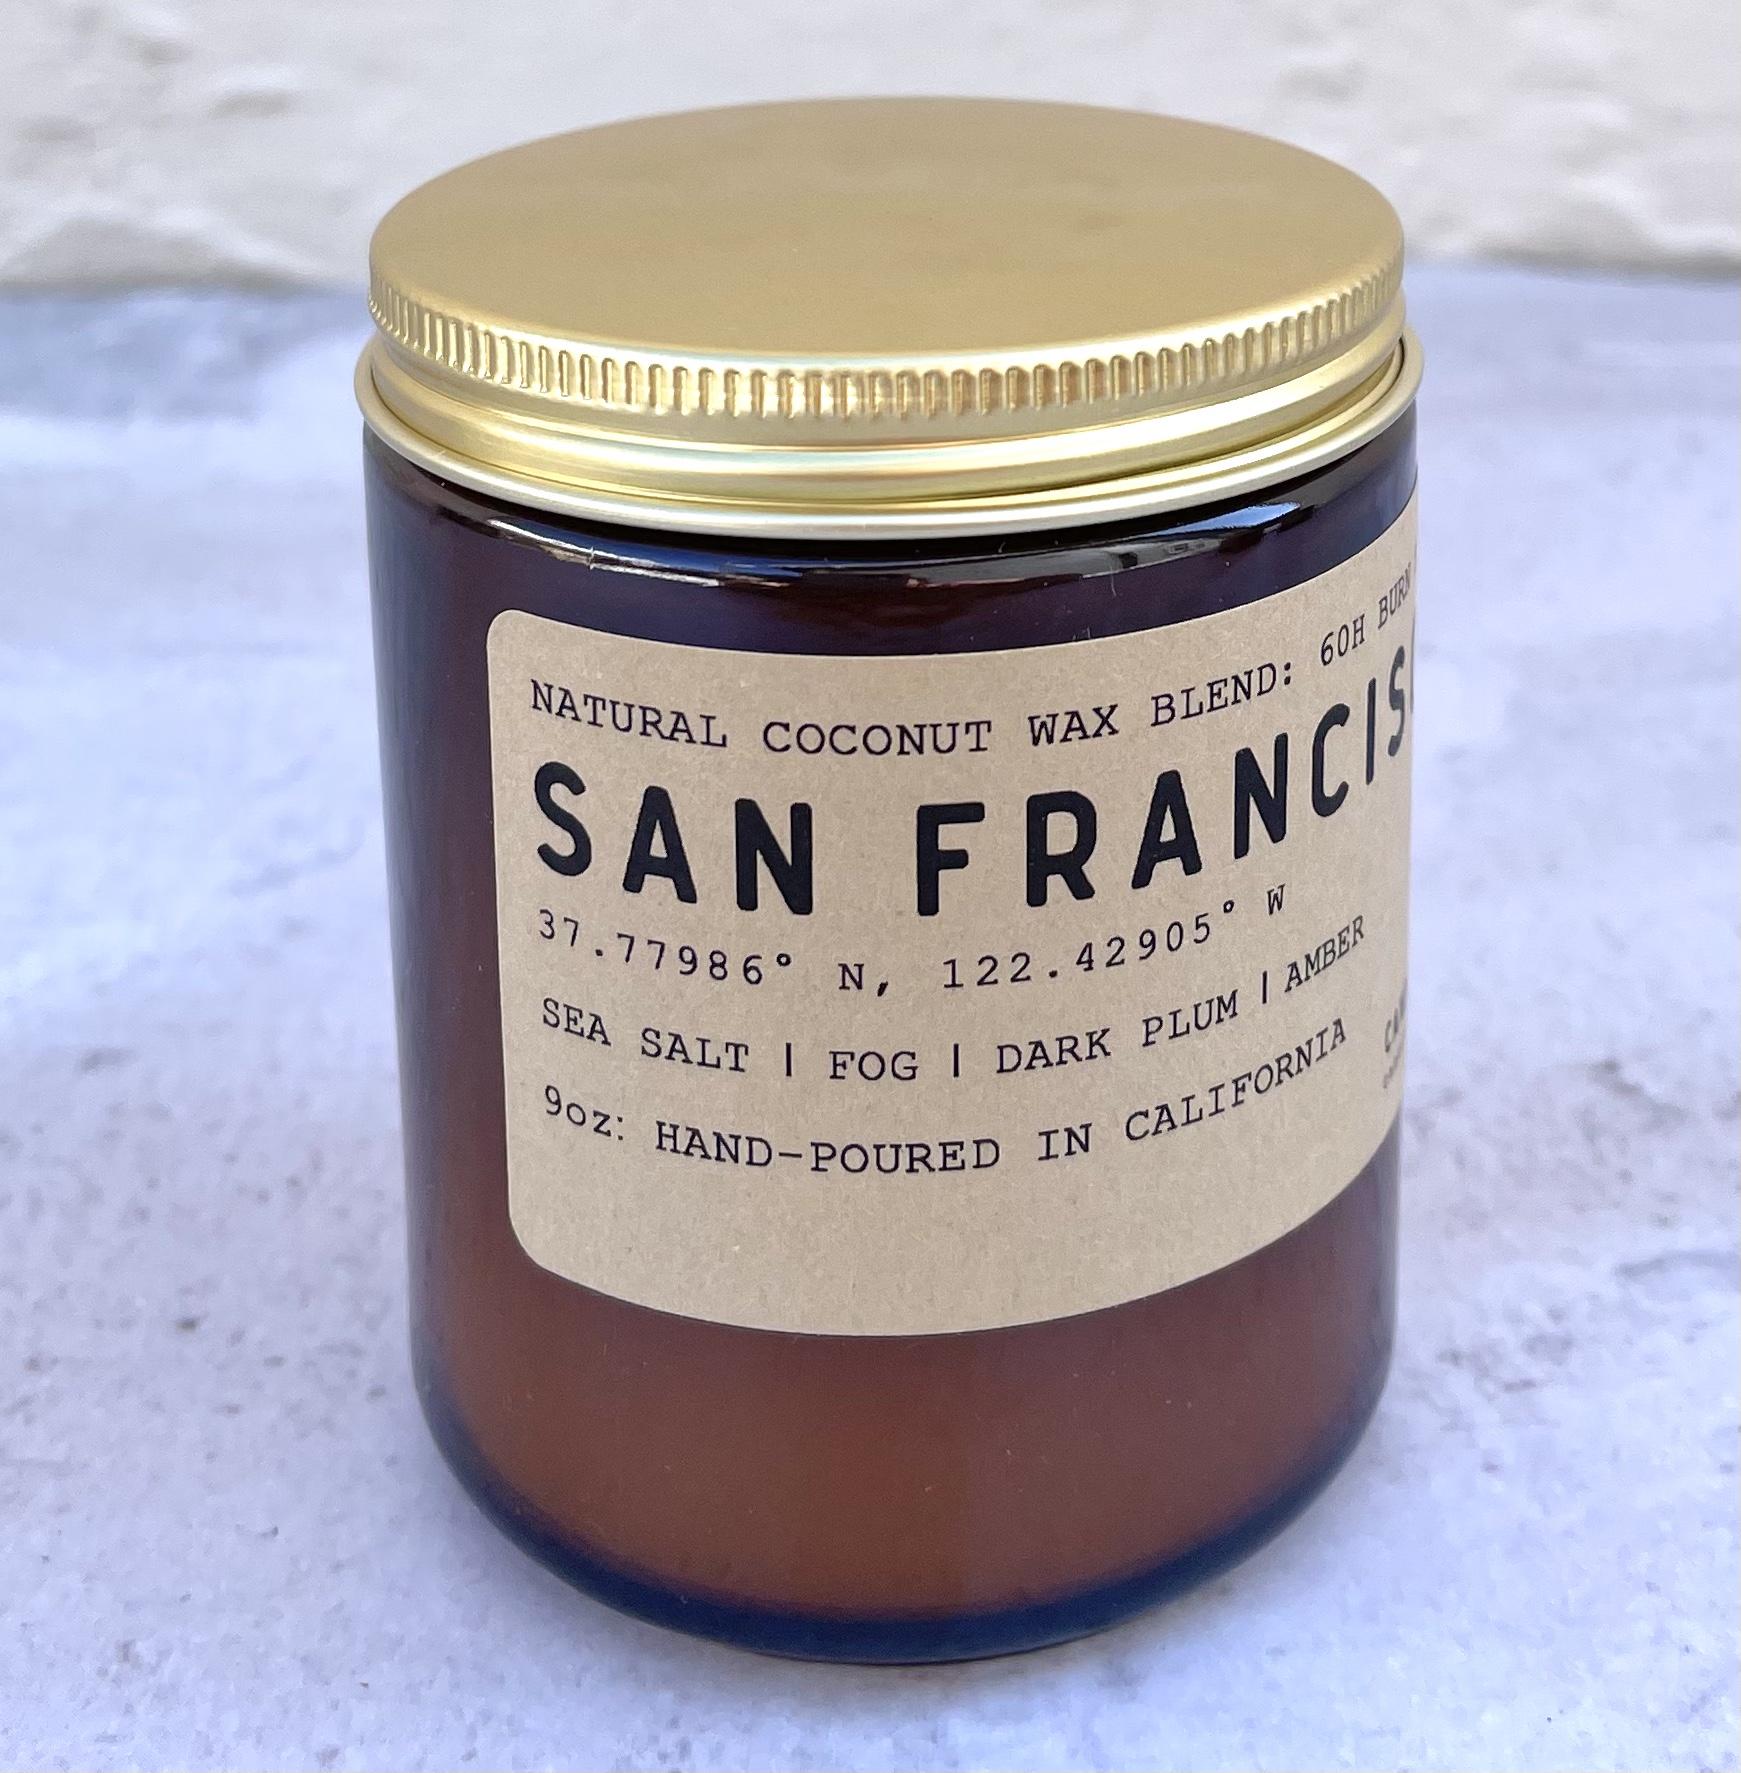 San Francisco: Soy wax candle